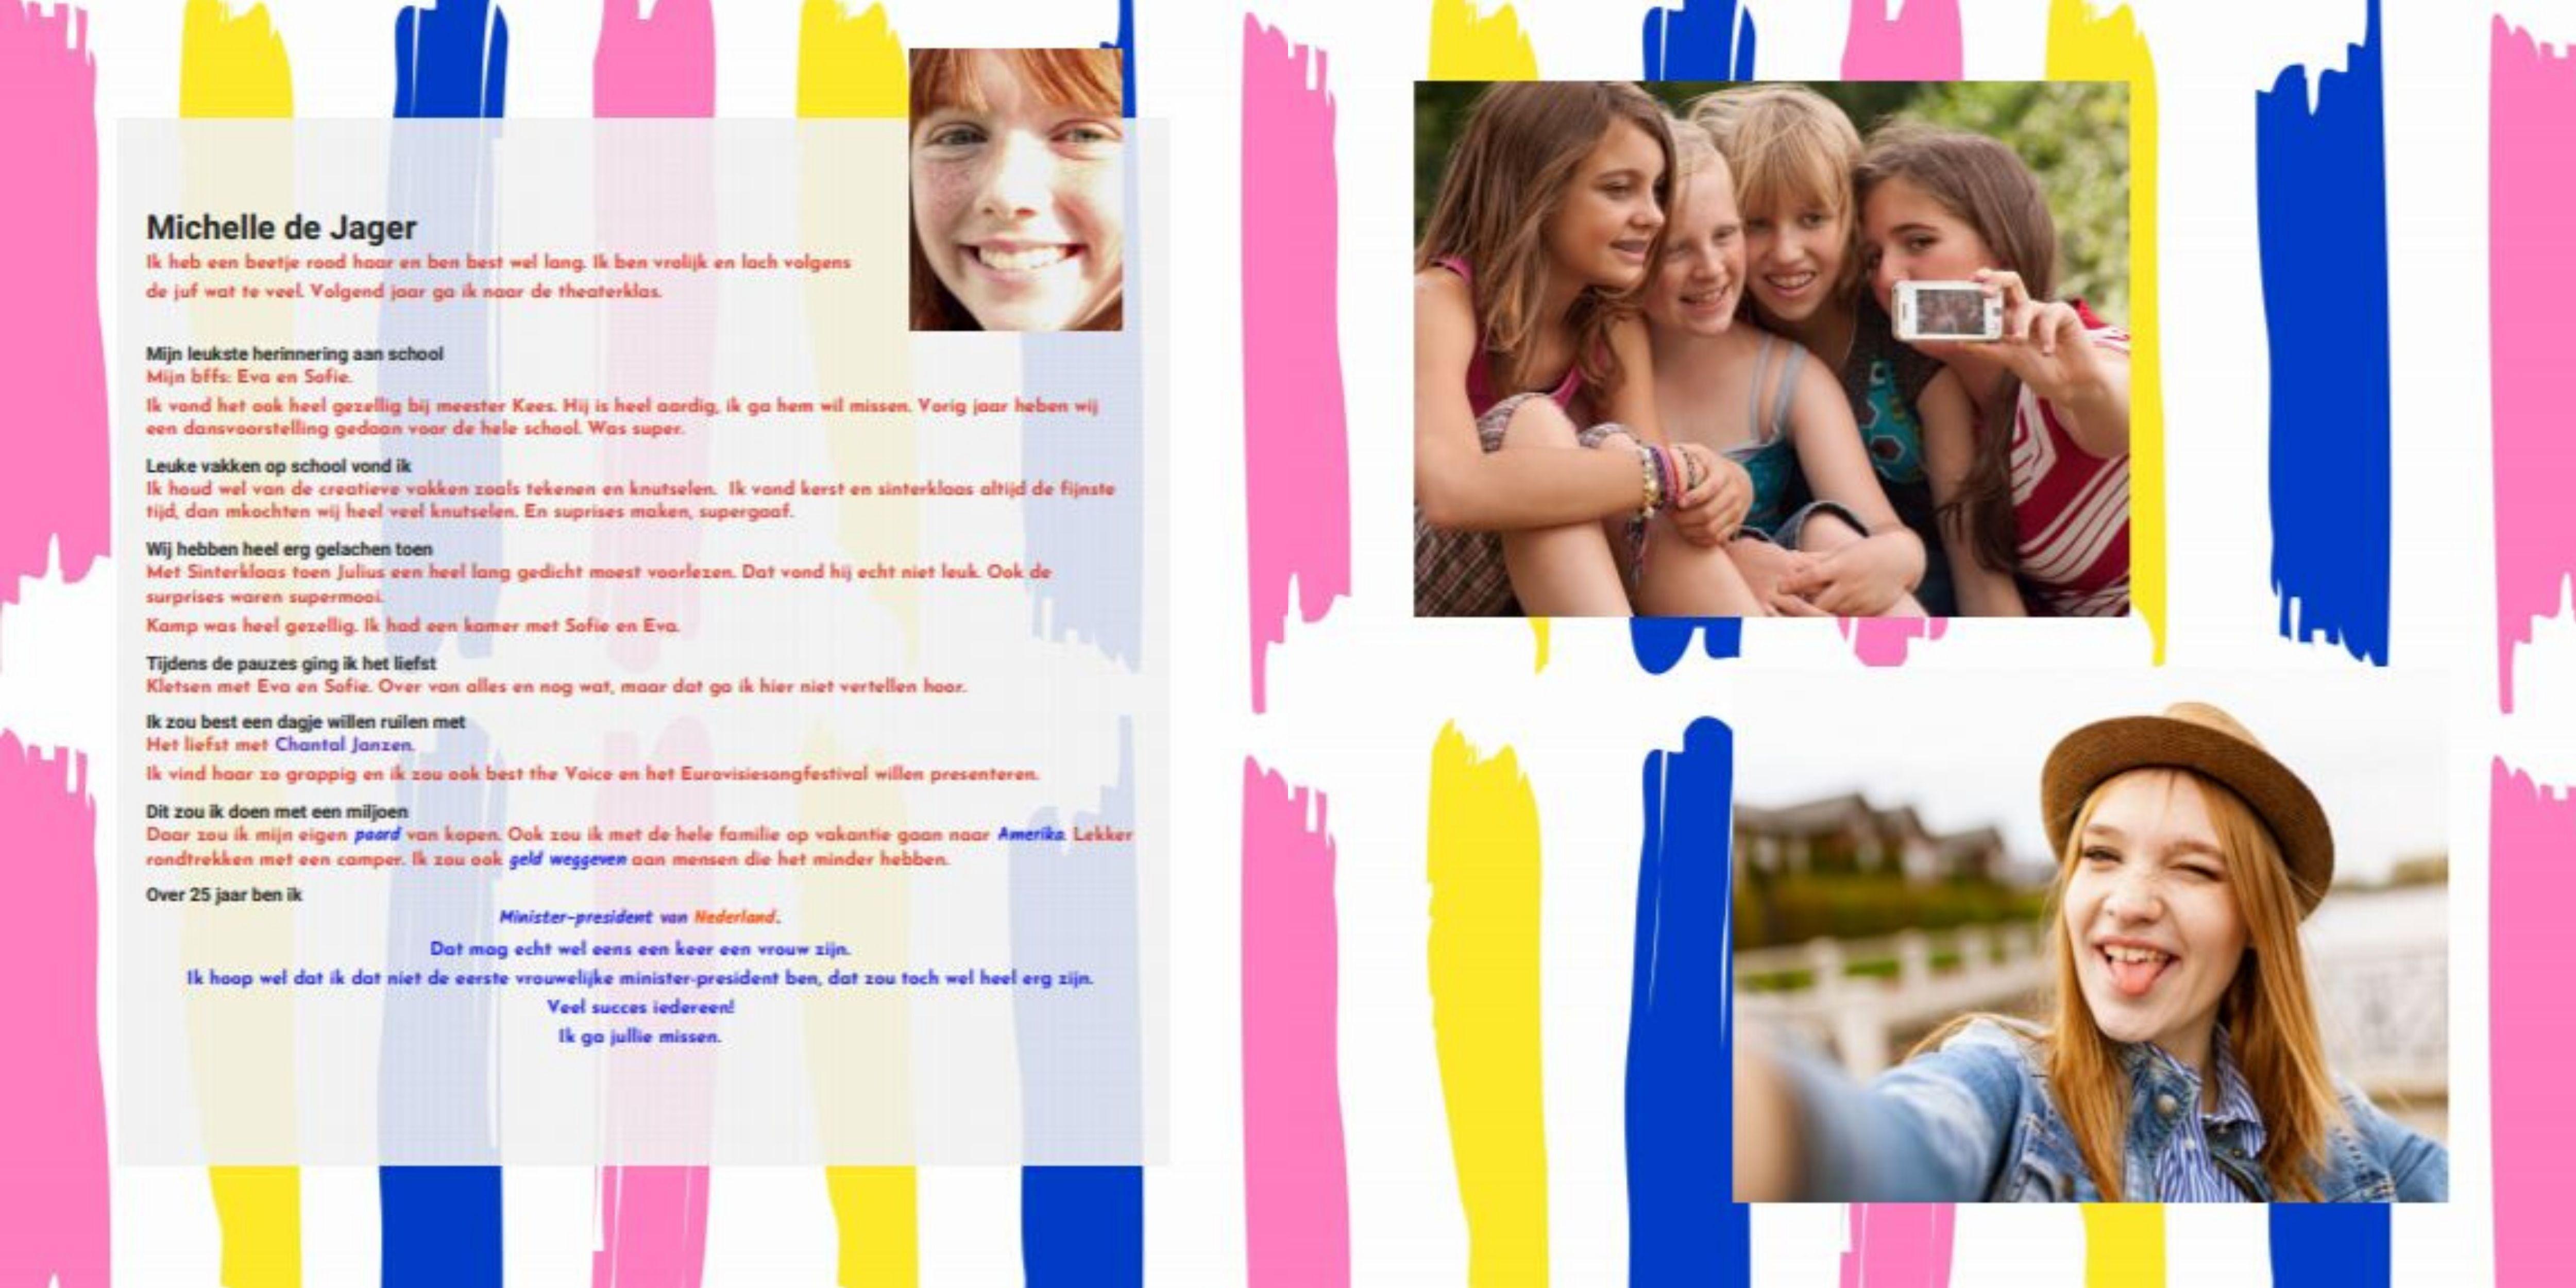 Uitgelezene Vriendenboeken - Blog - Results from #3 RK-88